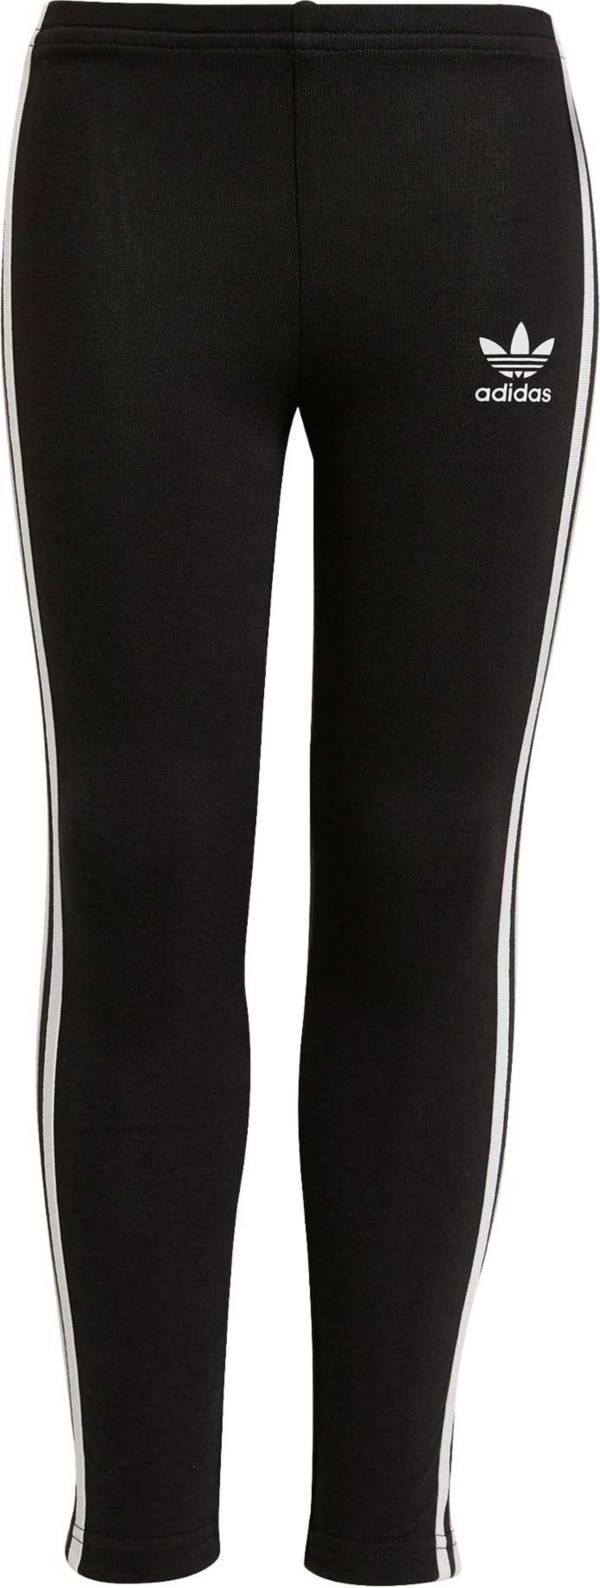 adidas Kids' Adicolor Leggings product image